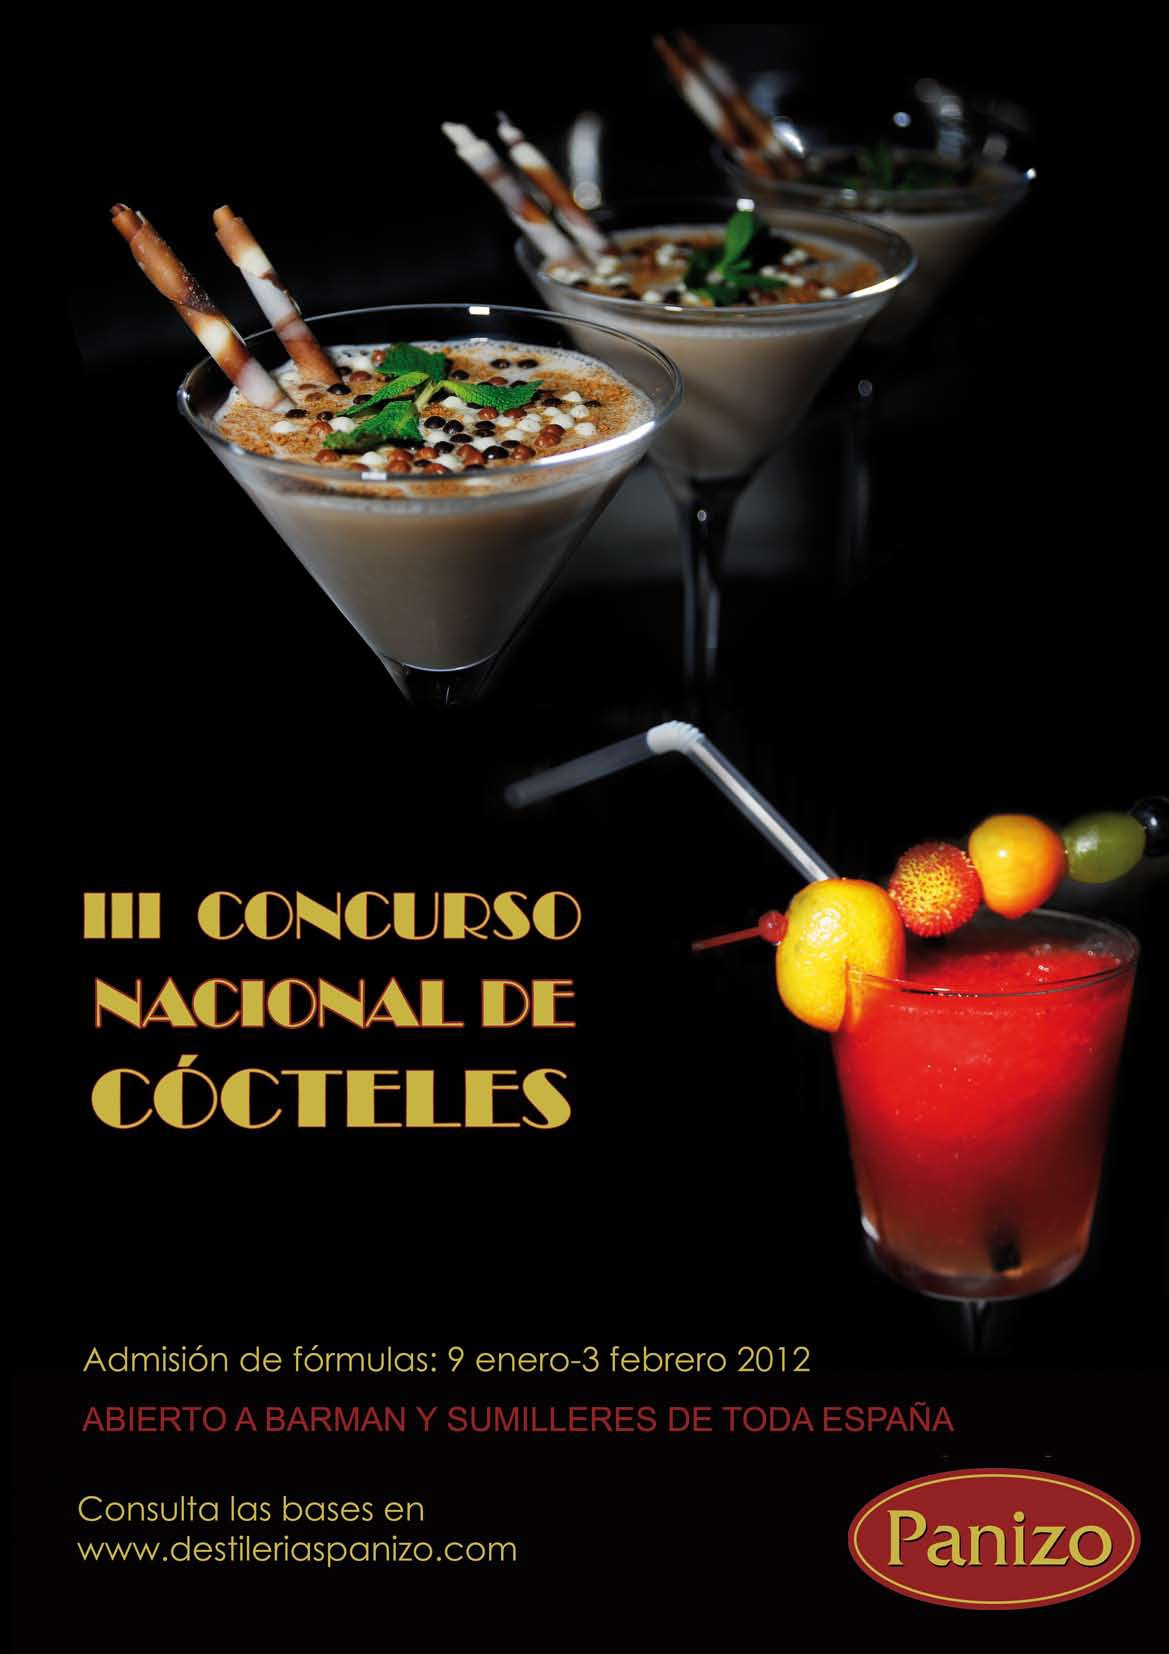 Concurso Cocteles Panizo 1